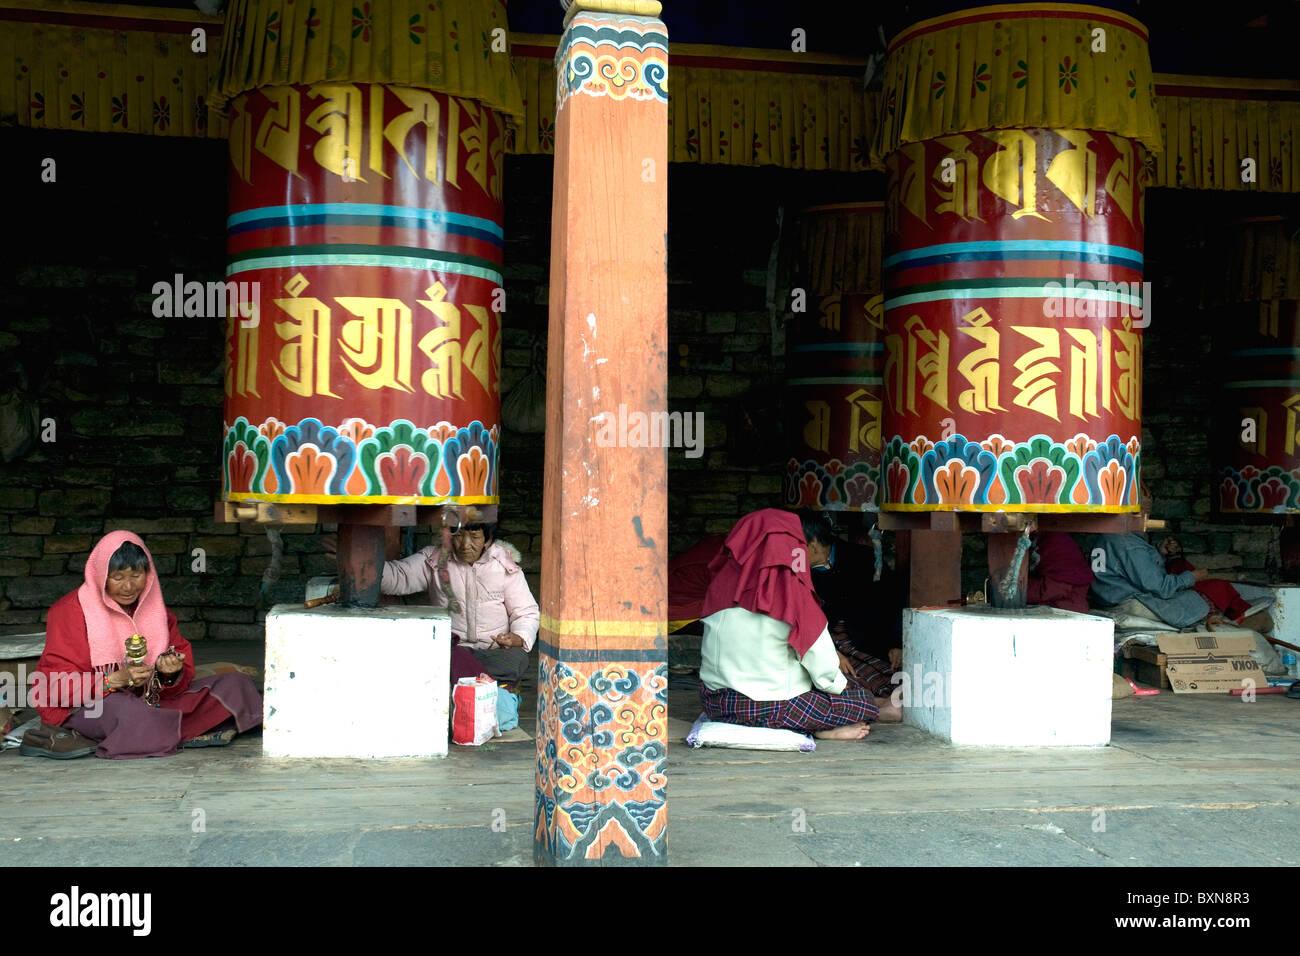 Pilgrims resting beside large prayer wheels at the Kyichu Lakh Buddhist temple near Thimpu in Bhutan - Stock Image